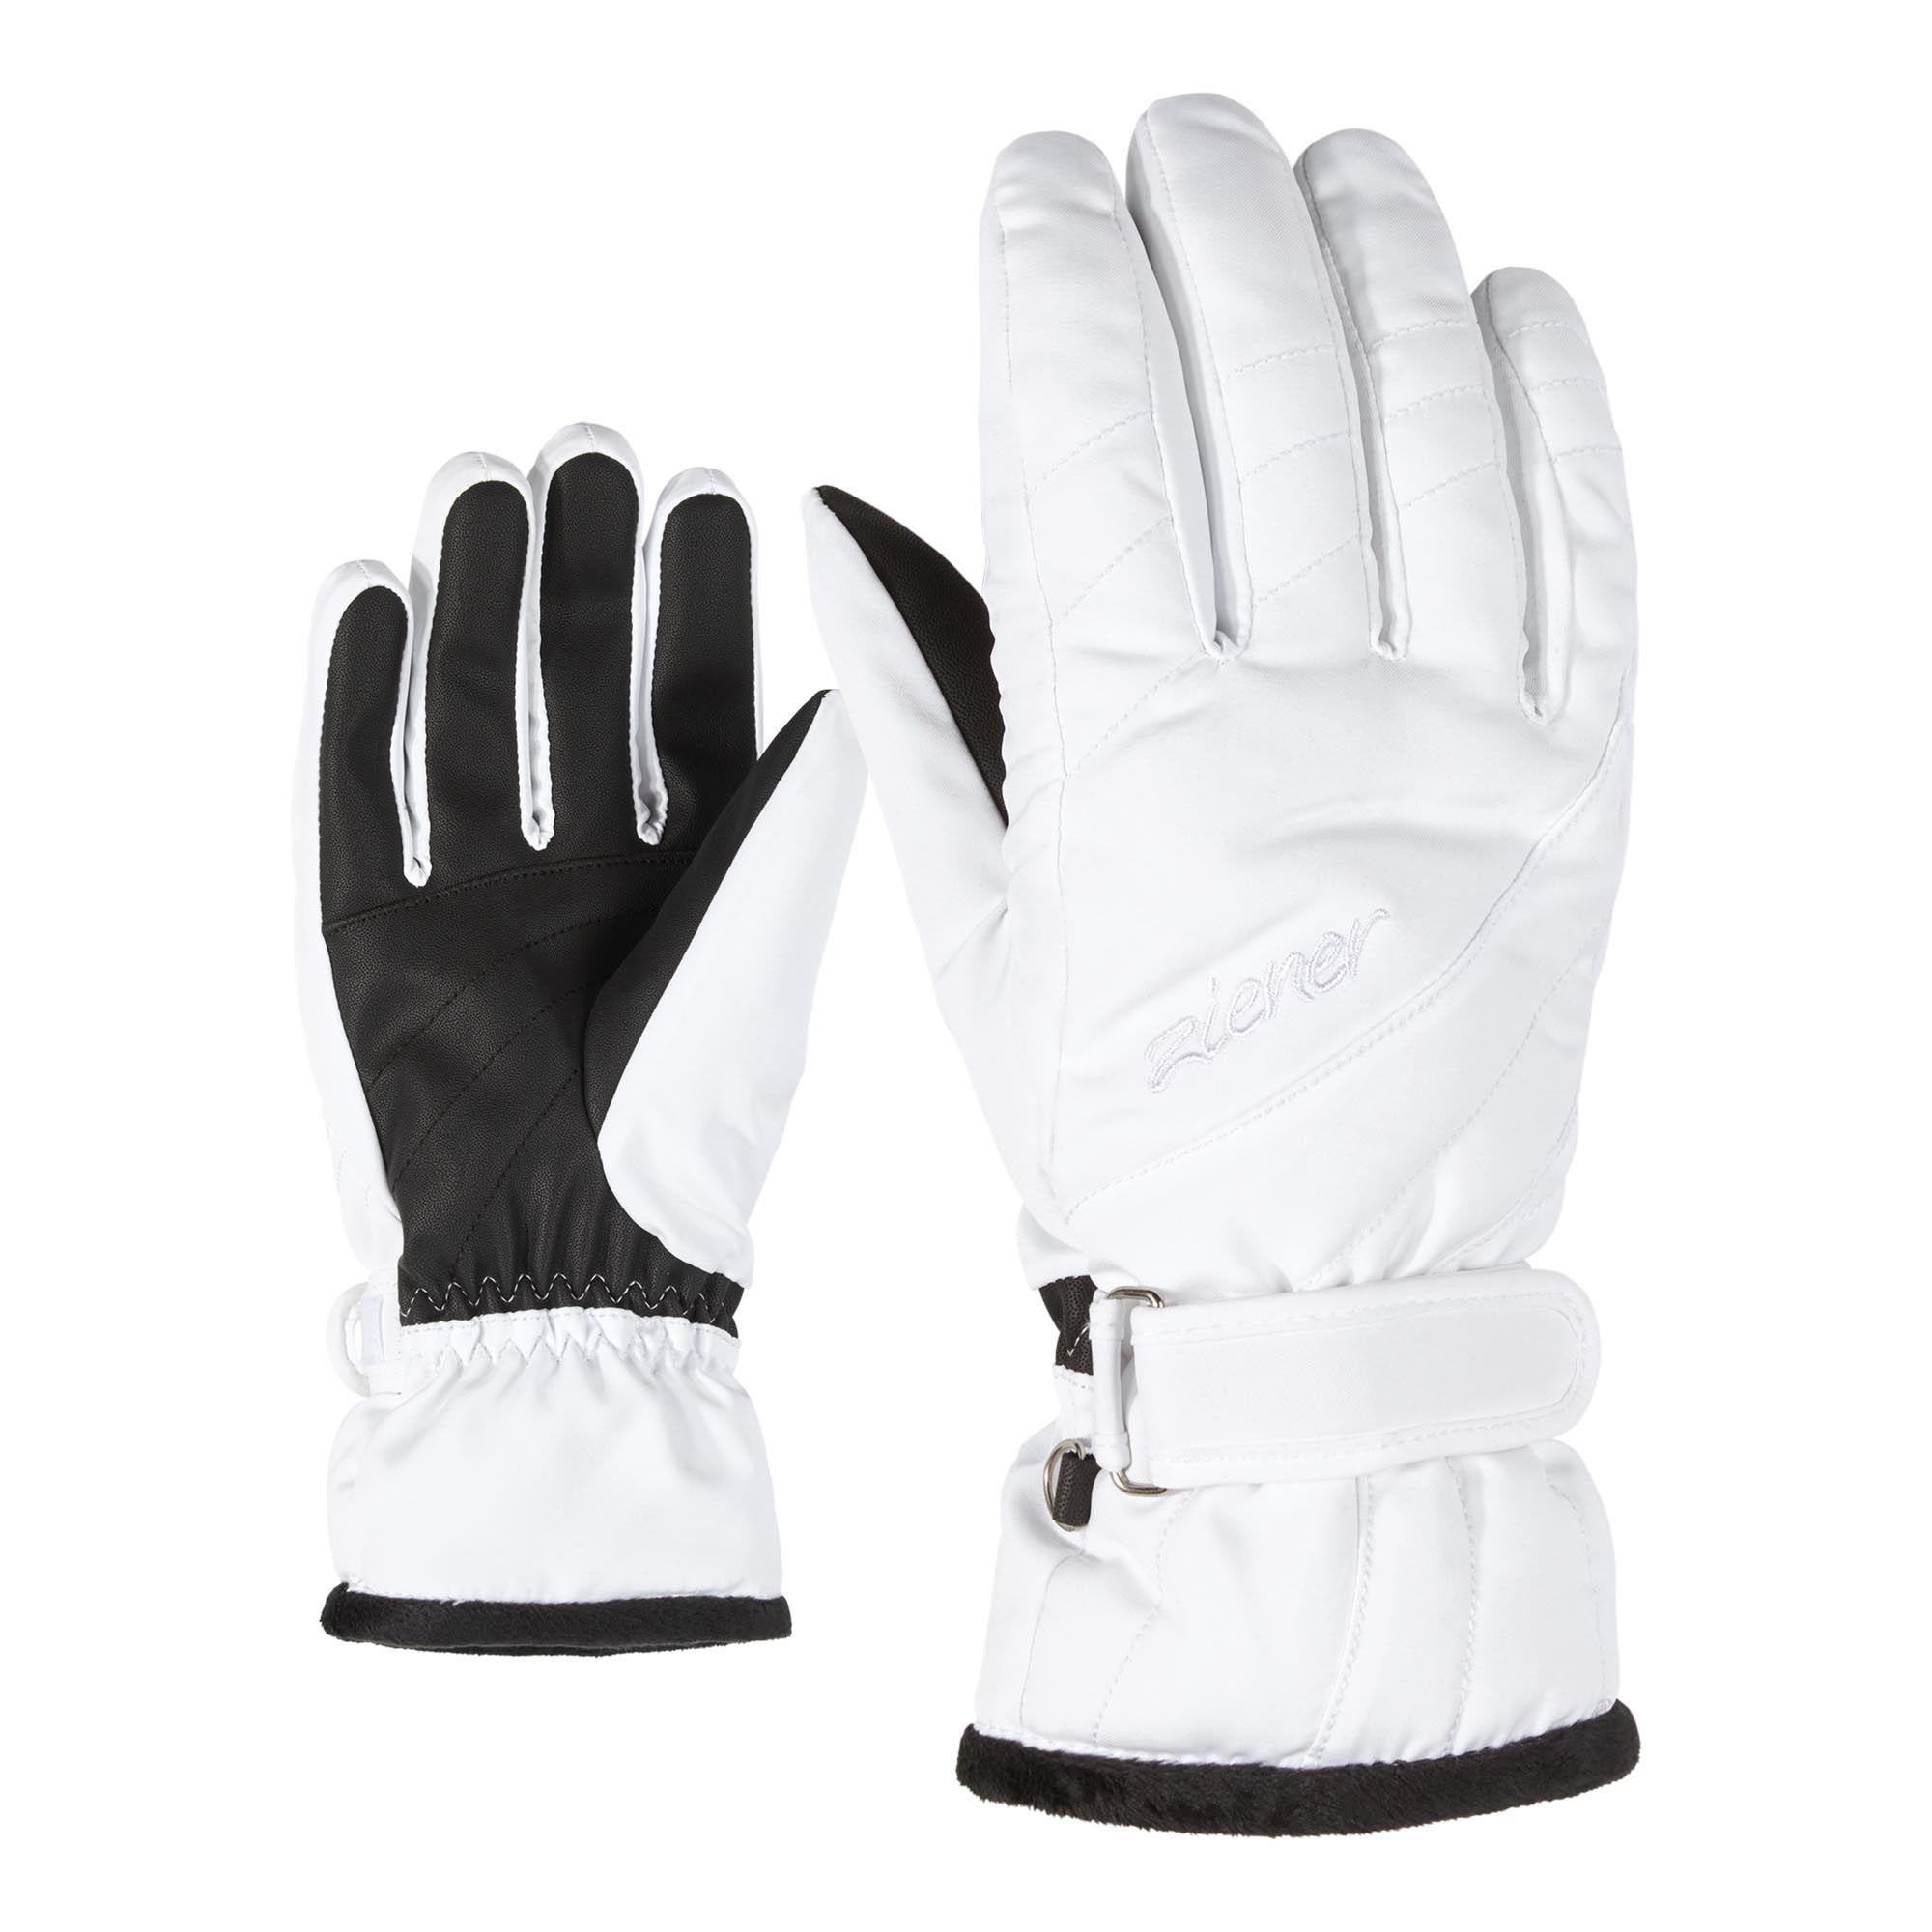 Ziener Kinga Pr Lady Glove Gant de Ski Femme